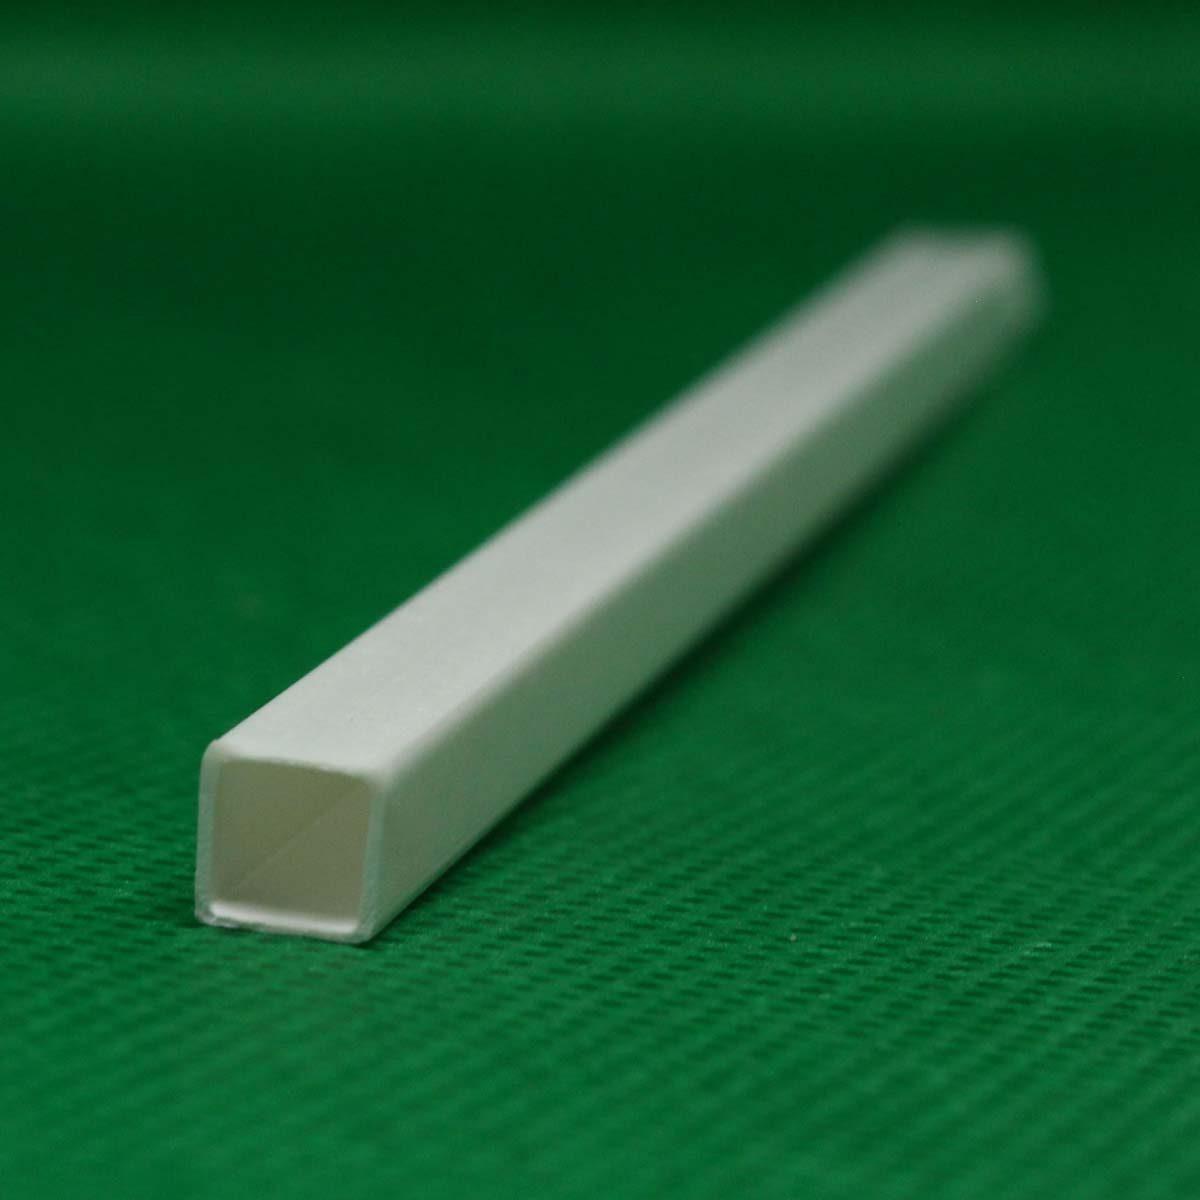 Model Box Beam/Girder 6mm x 6mm x 500mm